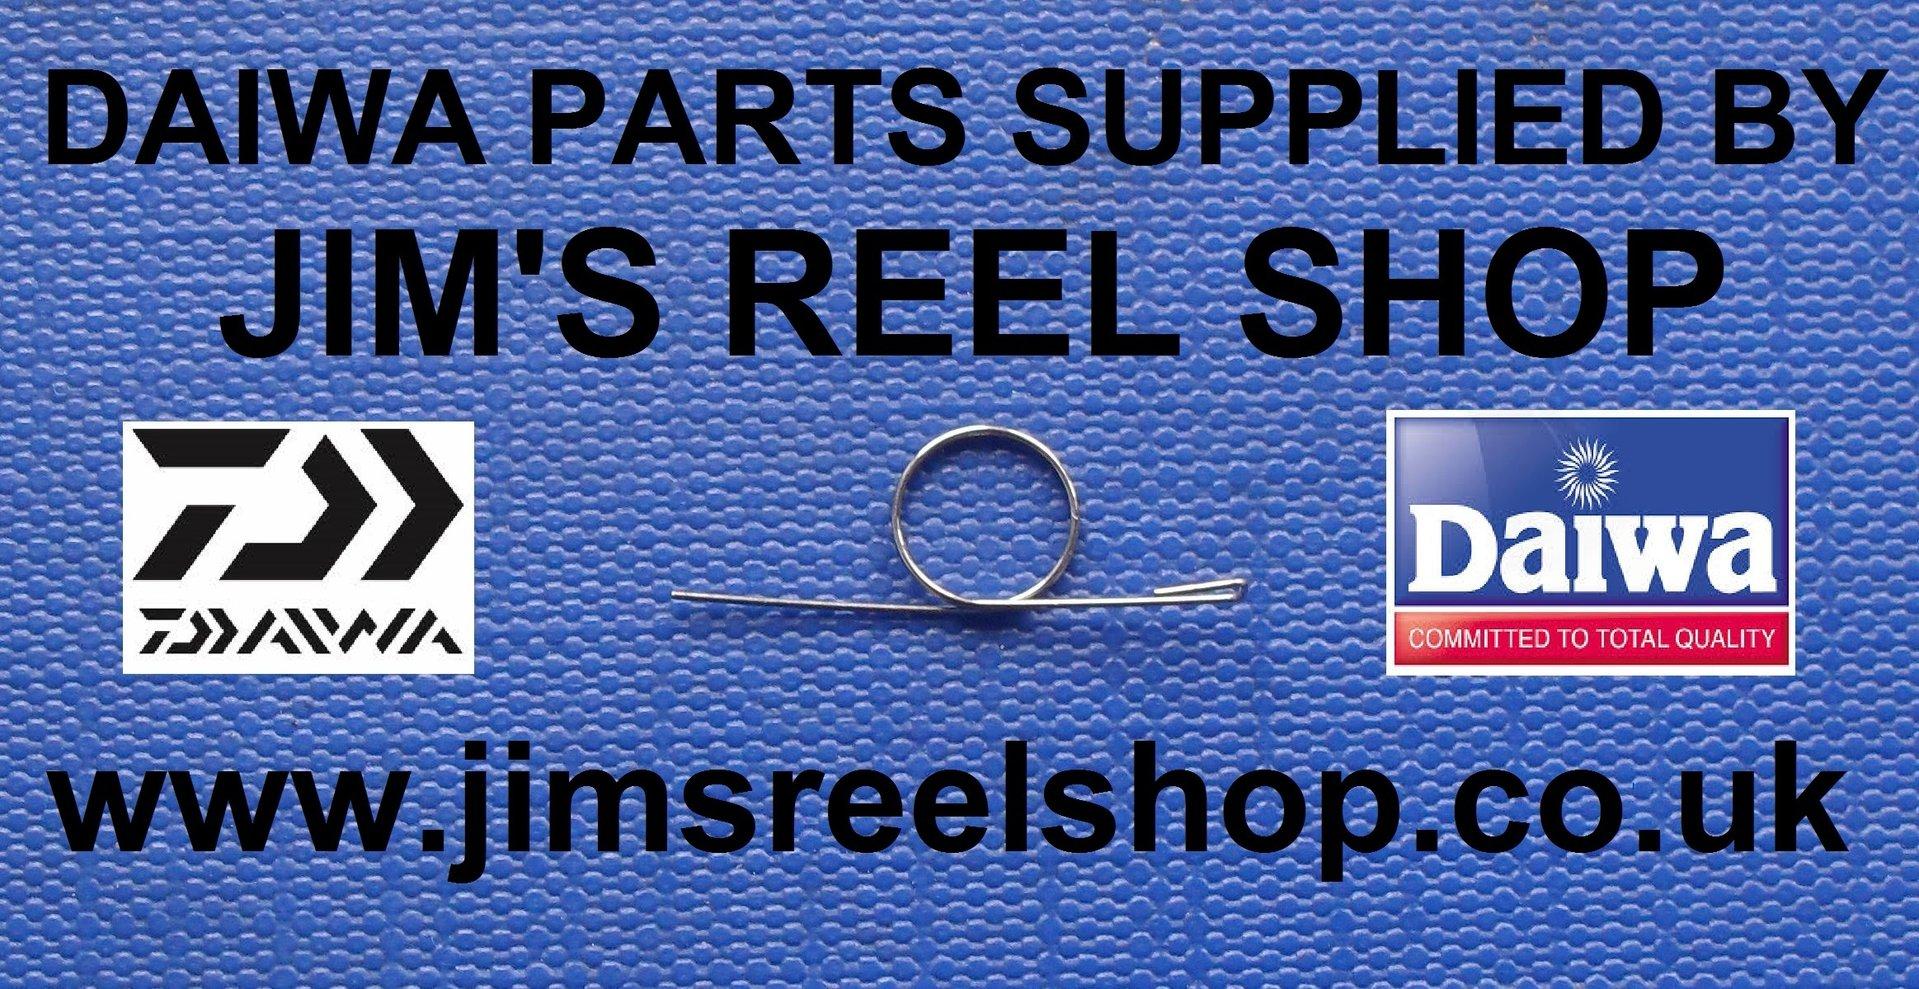 a9cb40375b3 DAIWA SLOSH ANTI-REVERSE DOG SPRING'S #E31-6502 - Jim's Reel Shop